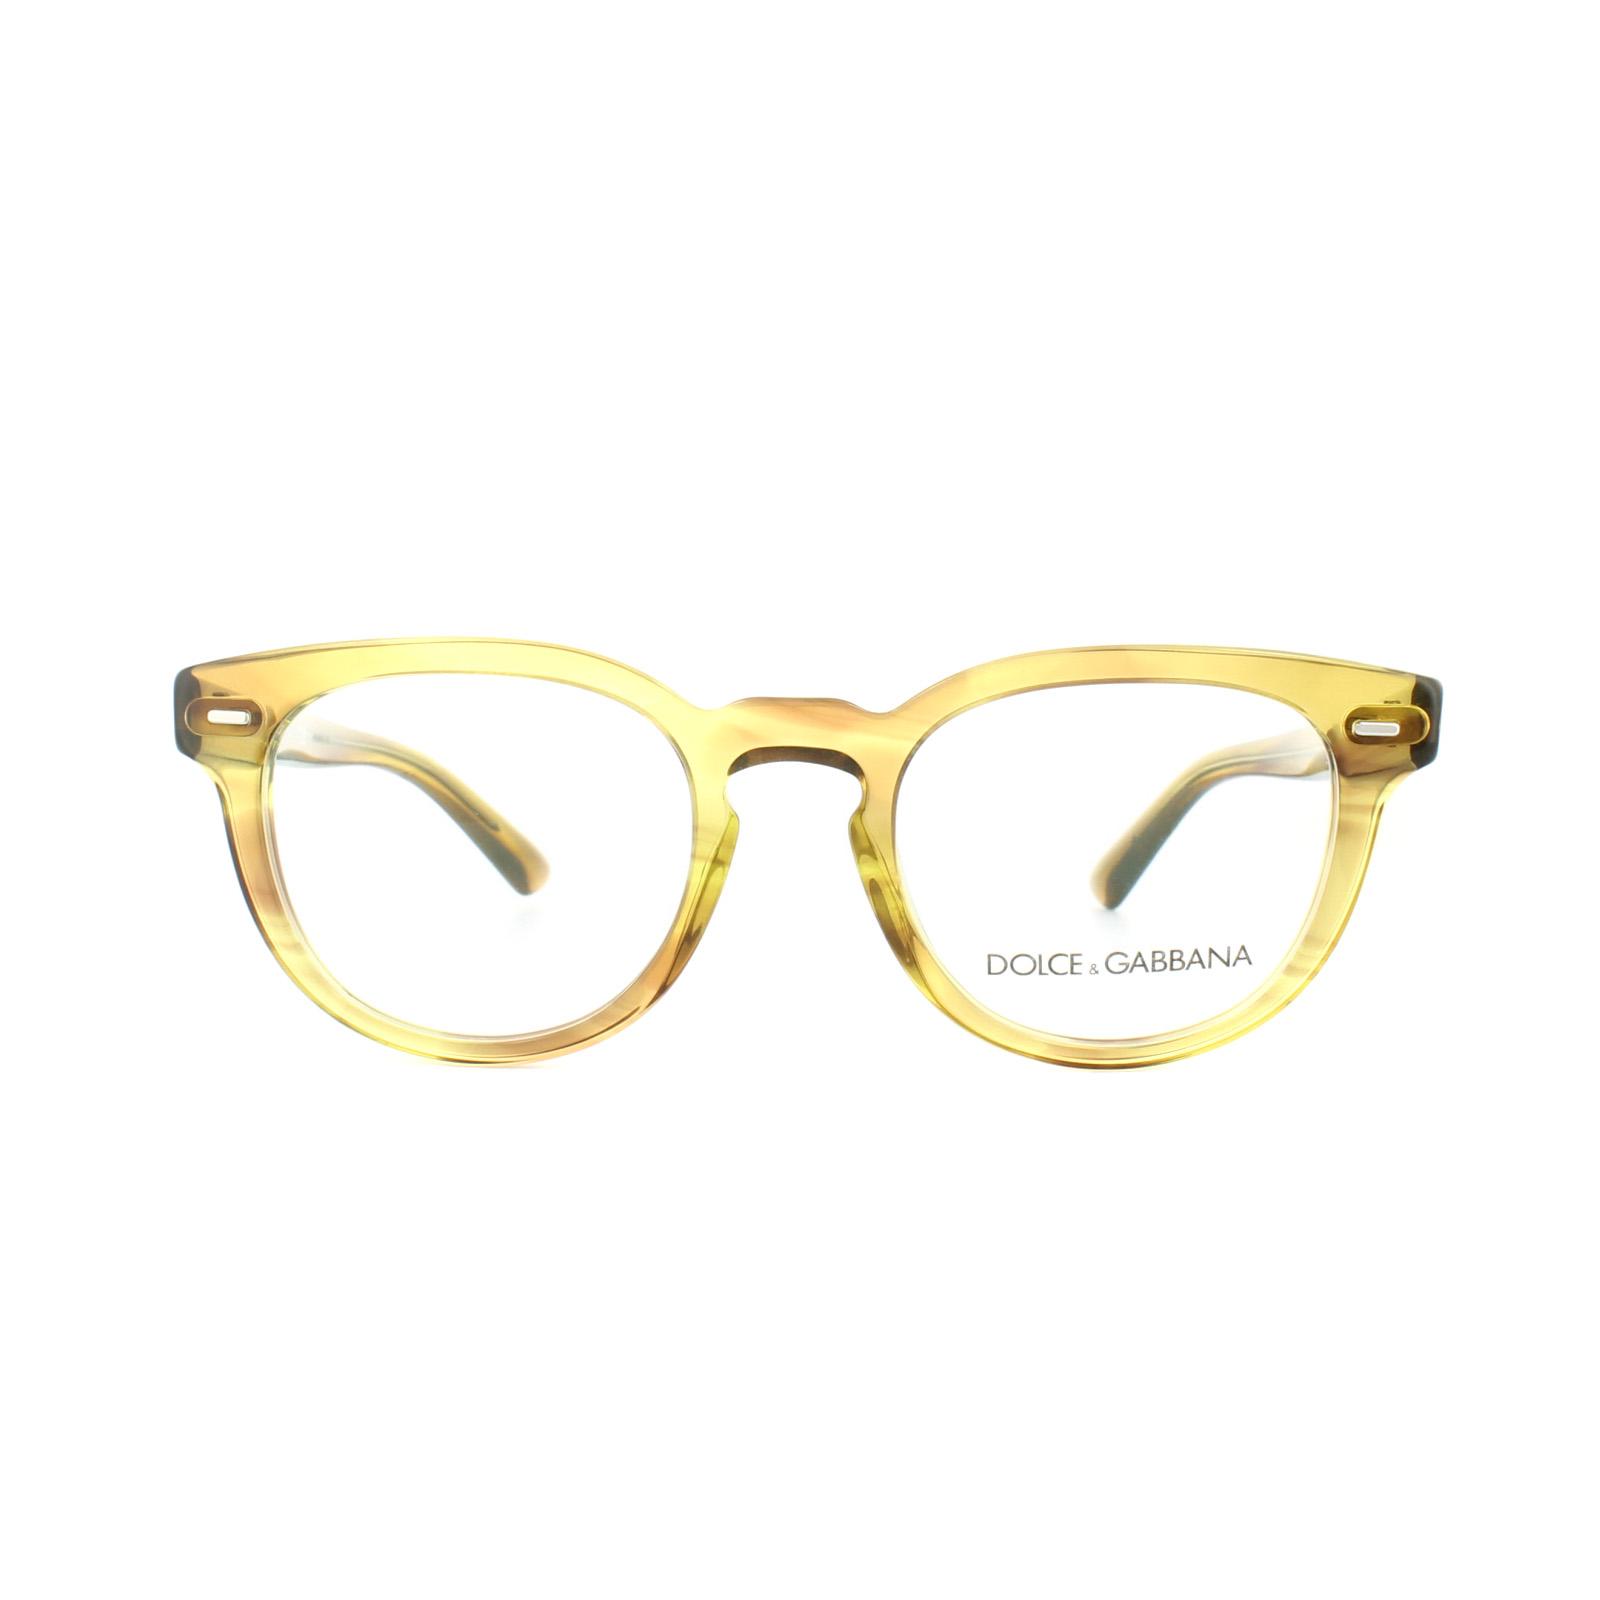 06f81ad586d2 Sentinel Dolce and Gabbana Glasses Frames DG 3225 2927 Striped Honey Mens  48mm